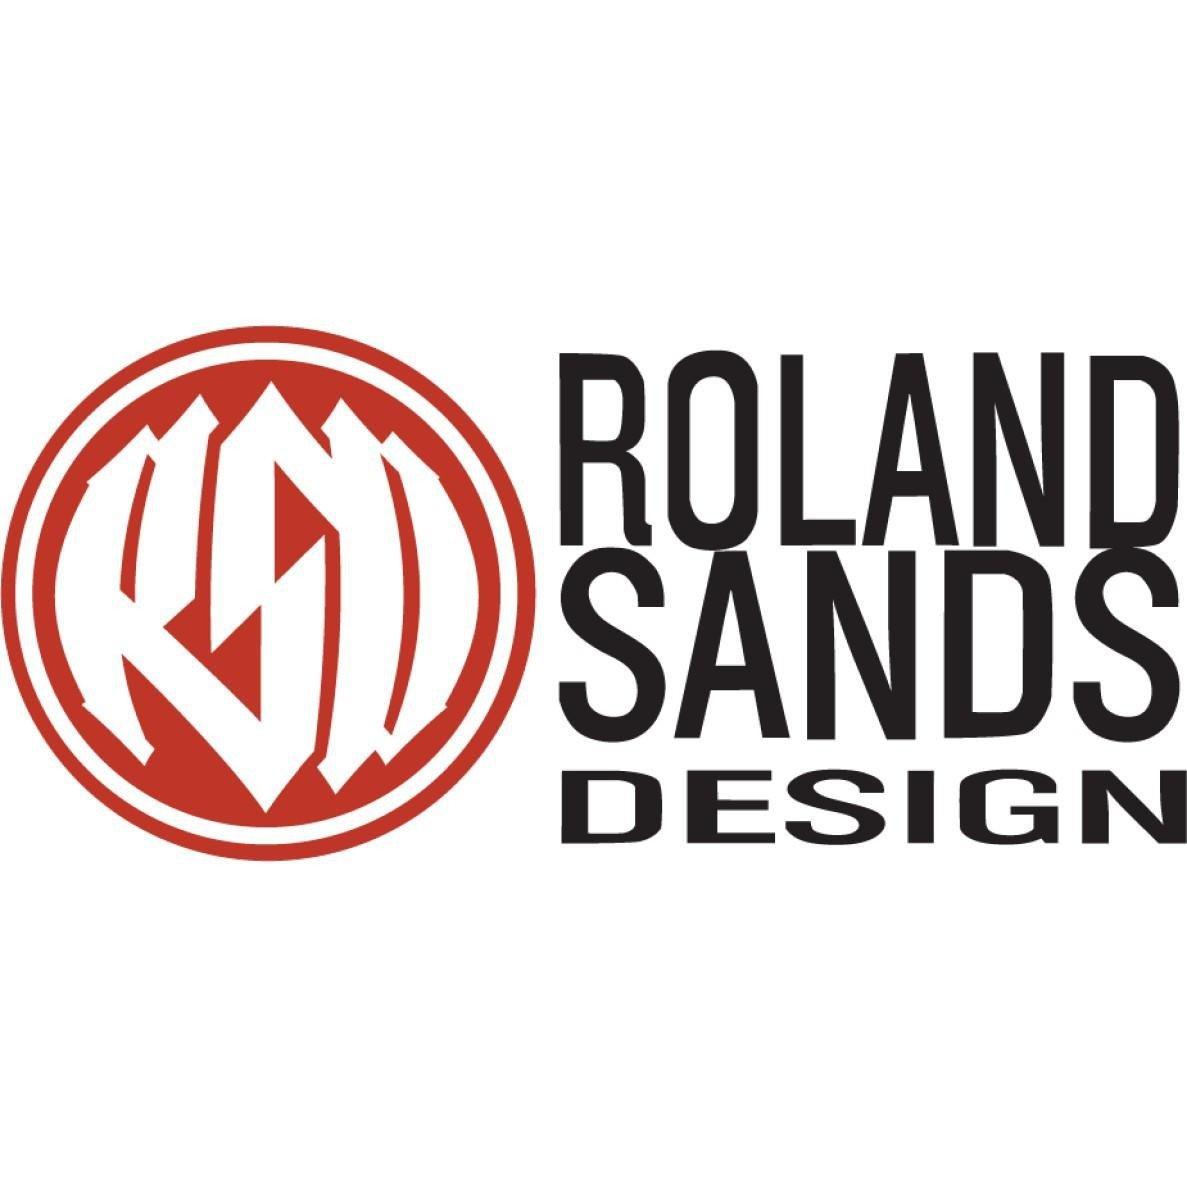 ROLAND SAND